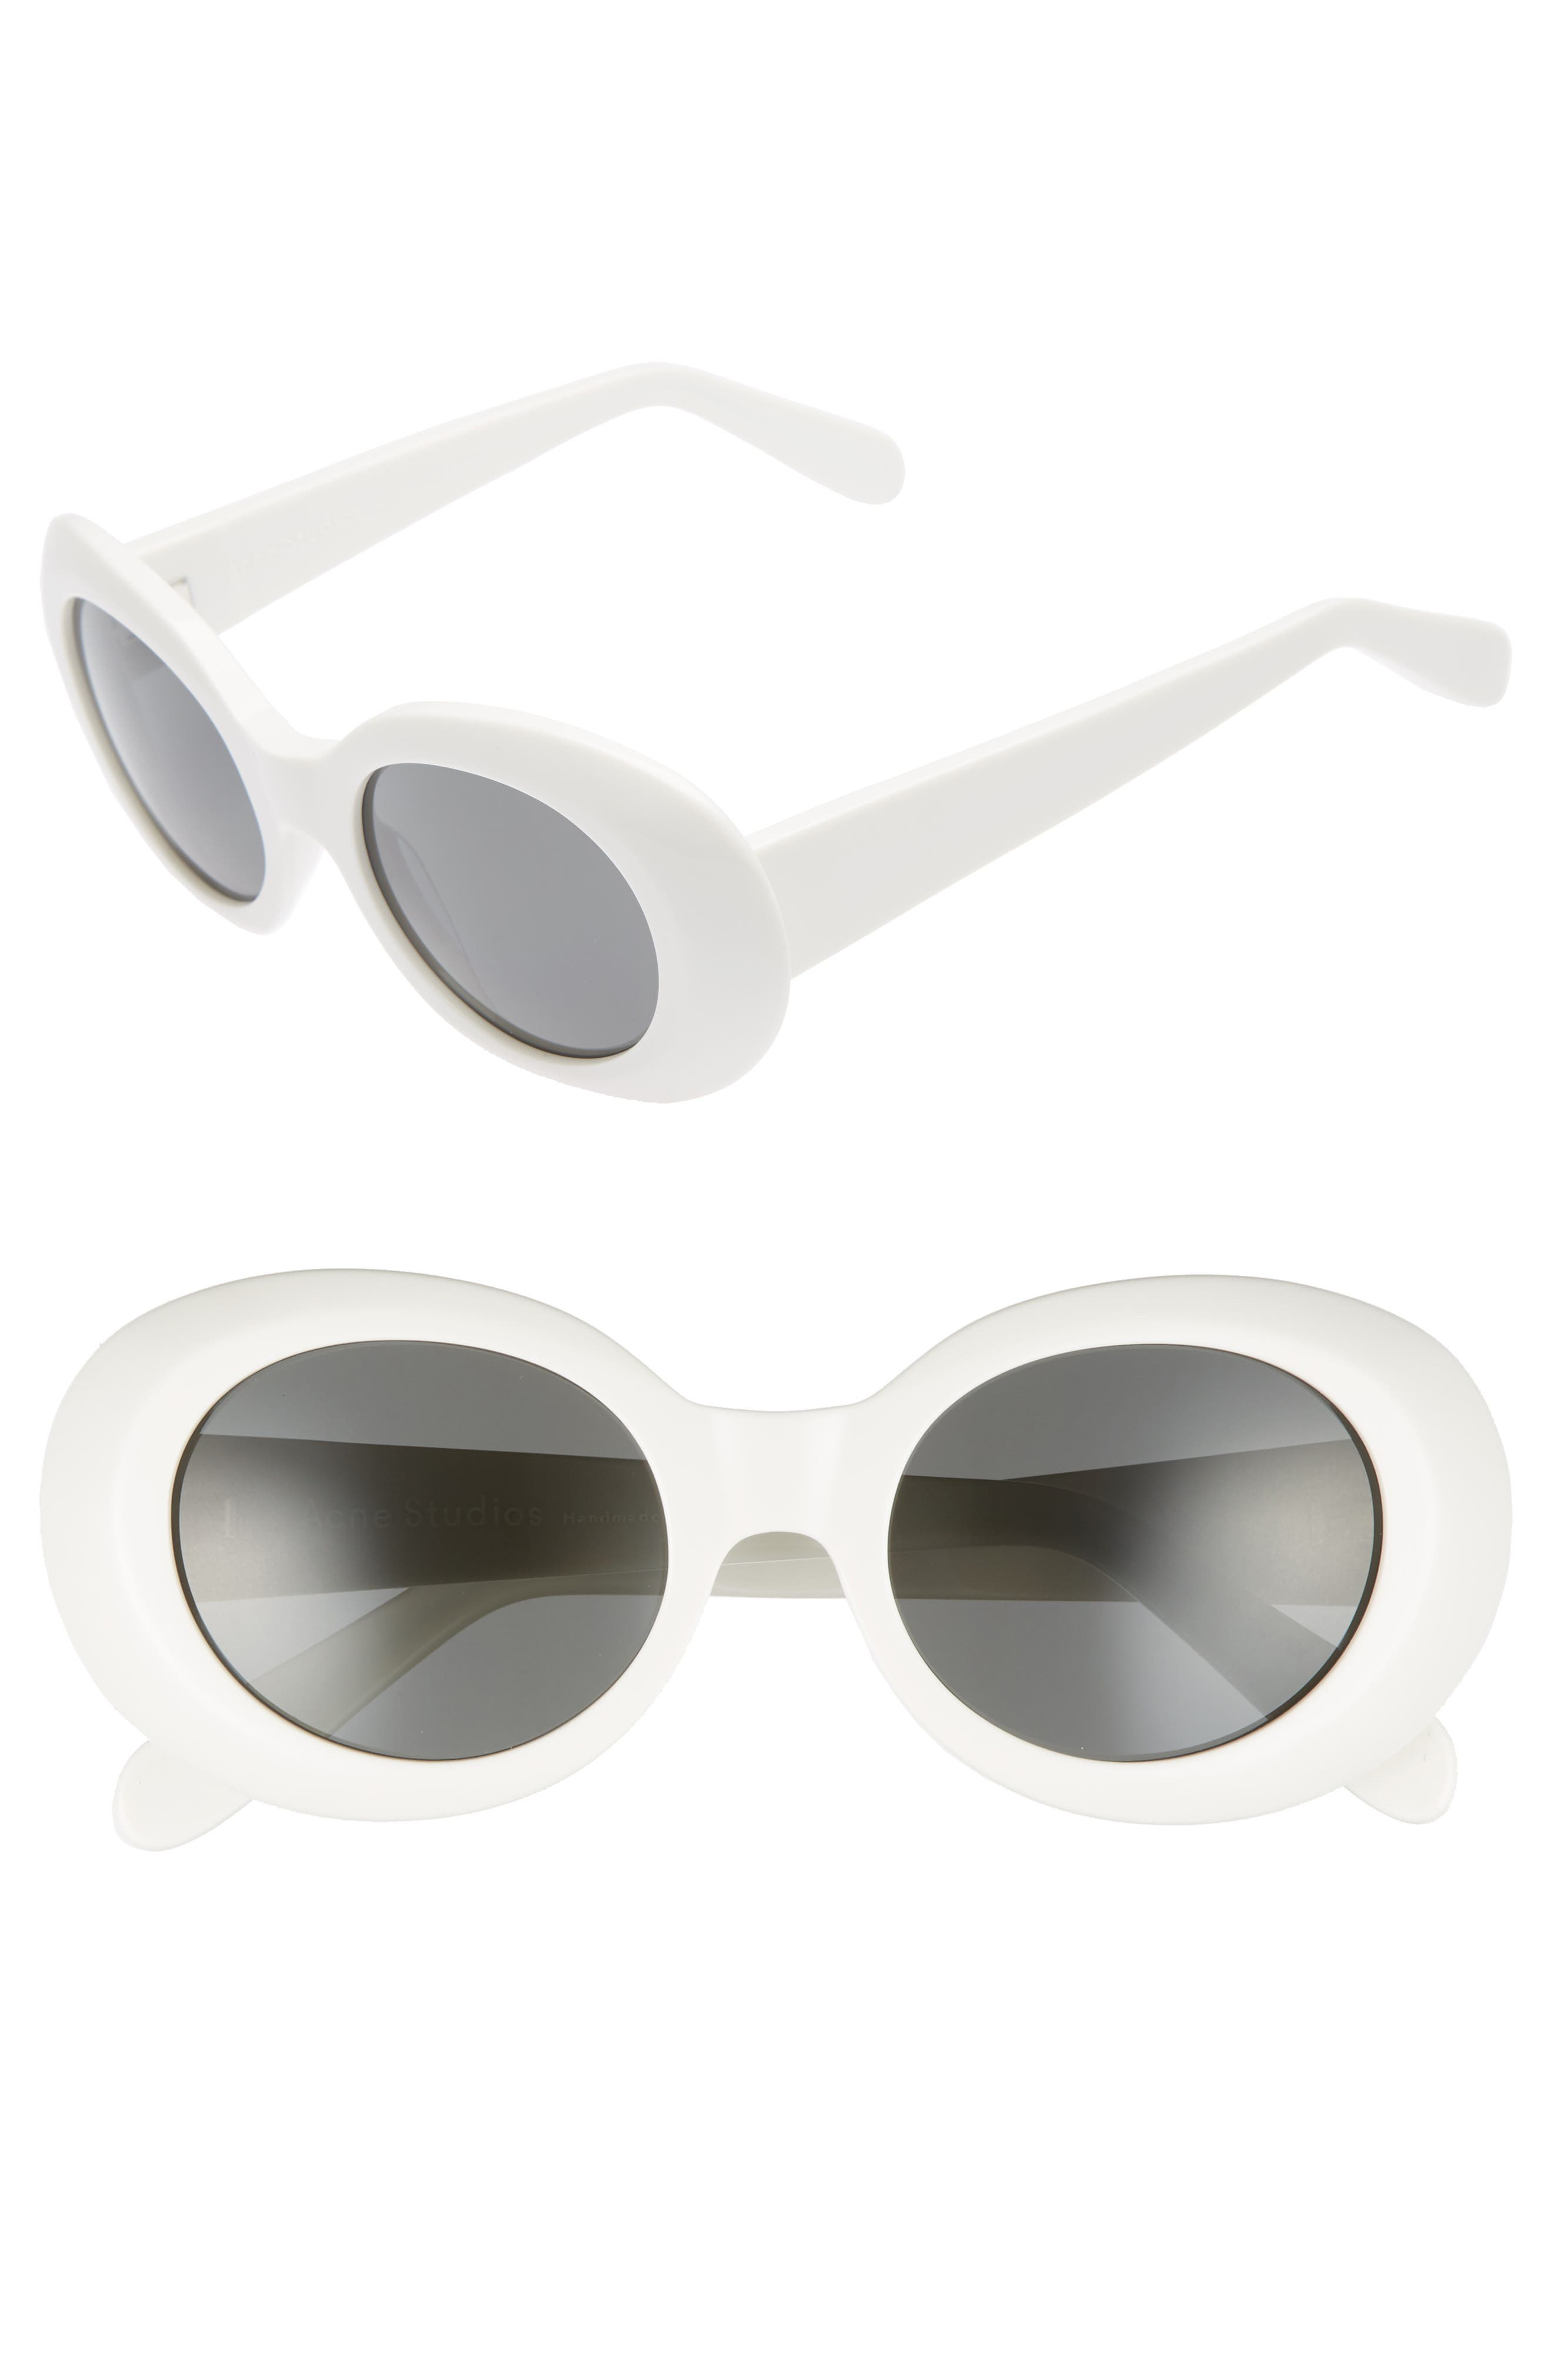 Mustang 48mm Sunglasses,                             Main thumbnail 1, color,                             Off White/ Black